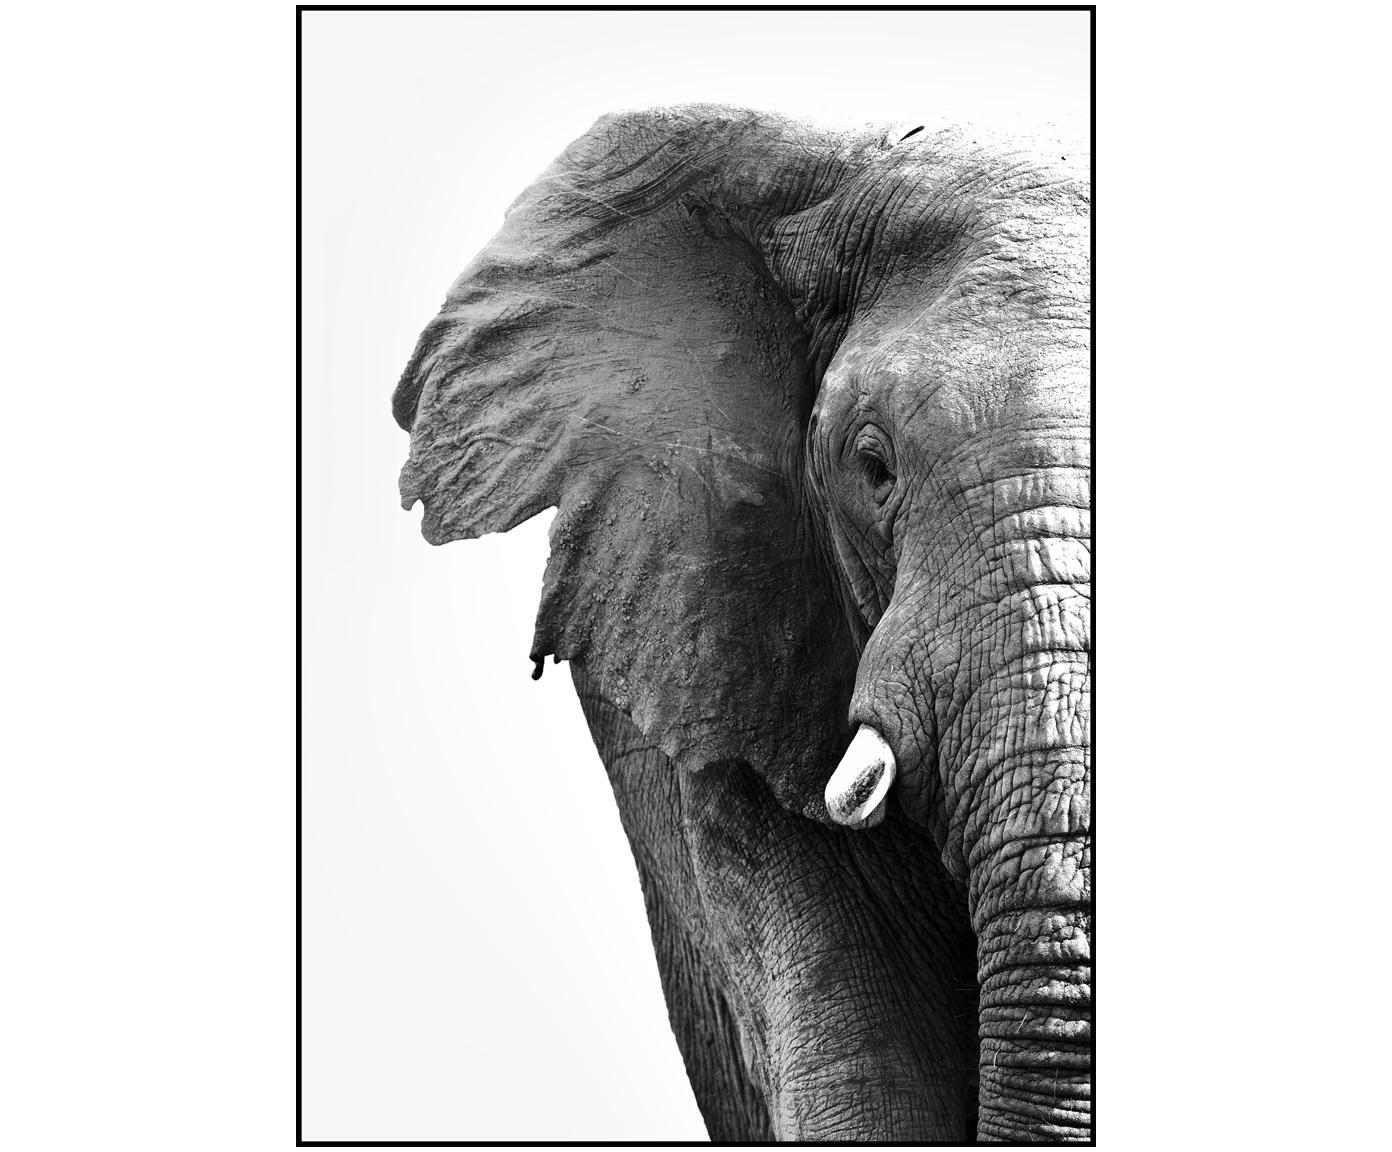 Ingelijste digitale print White Elephant, Afbeelding: digitale druk op papier (, Lijst: gelakt HDF, Zwart, wit, 30 x 40 cm